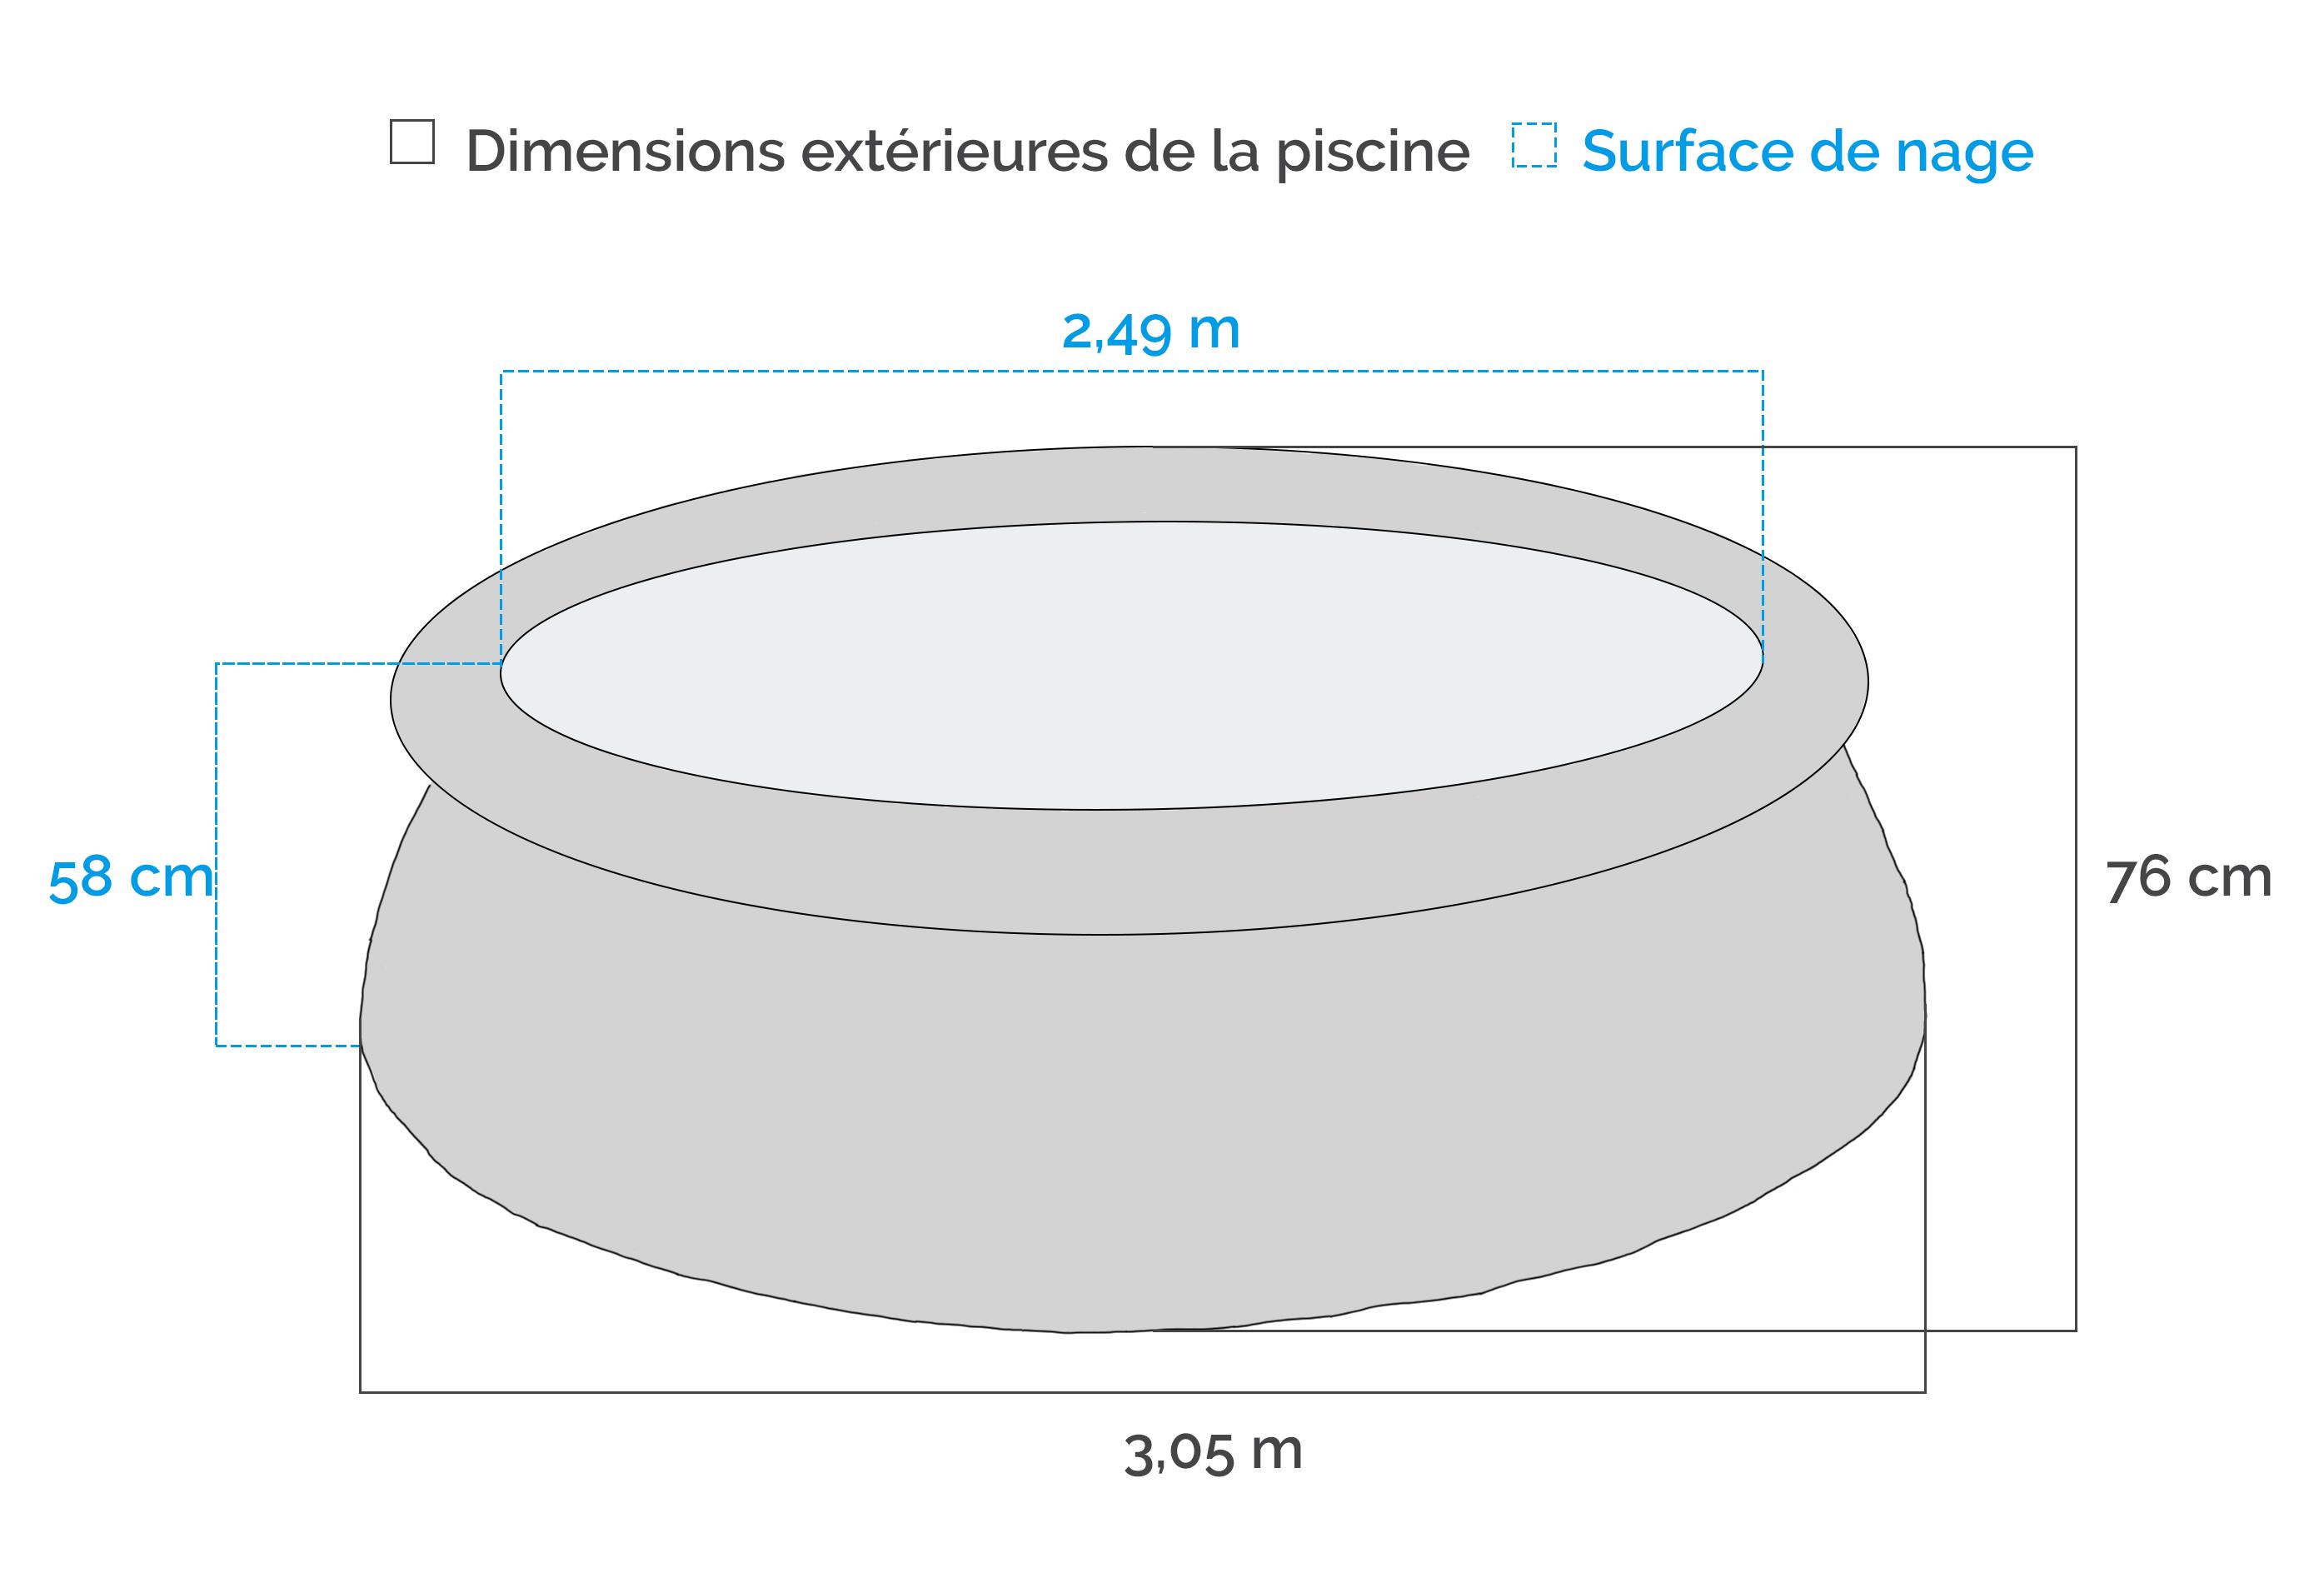 Accessoires piscine intex easy set - Piscine intex 4 57 x 0 91 ...